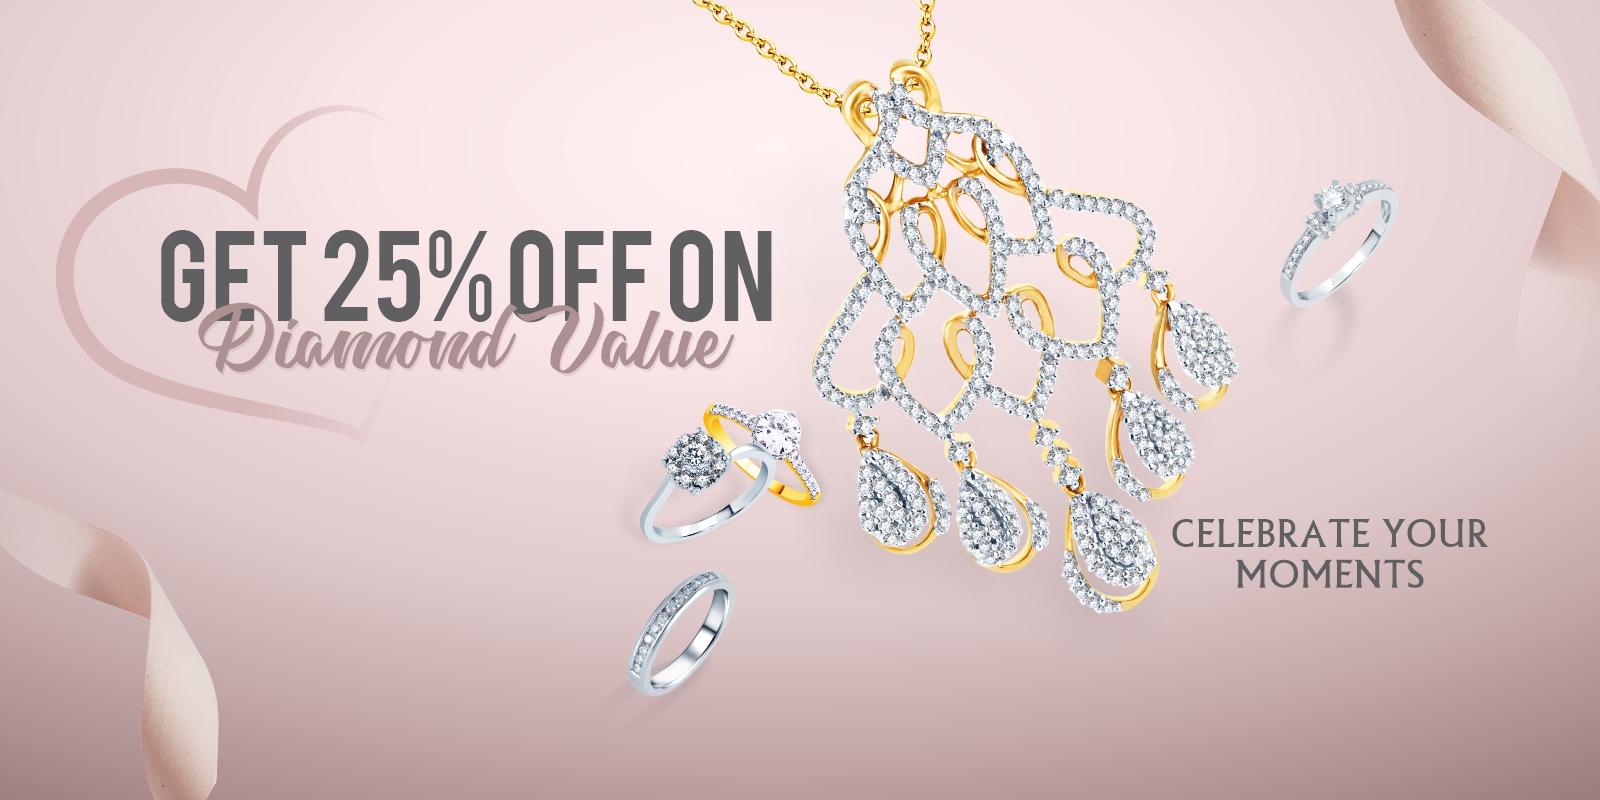 Get 25% Off on Diamond Value